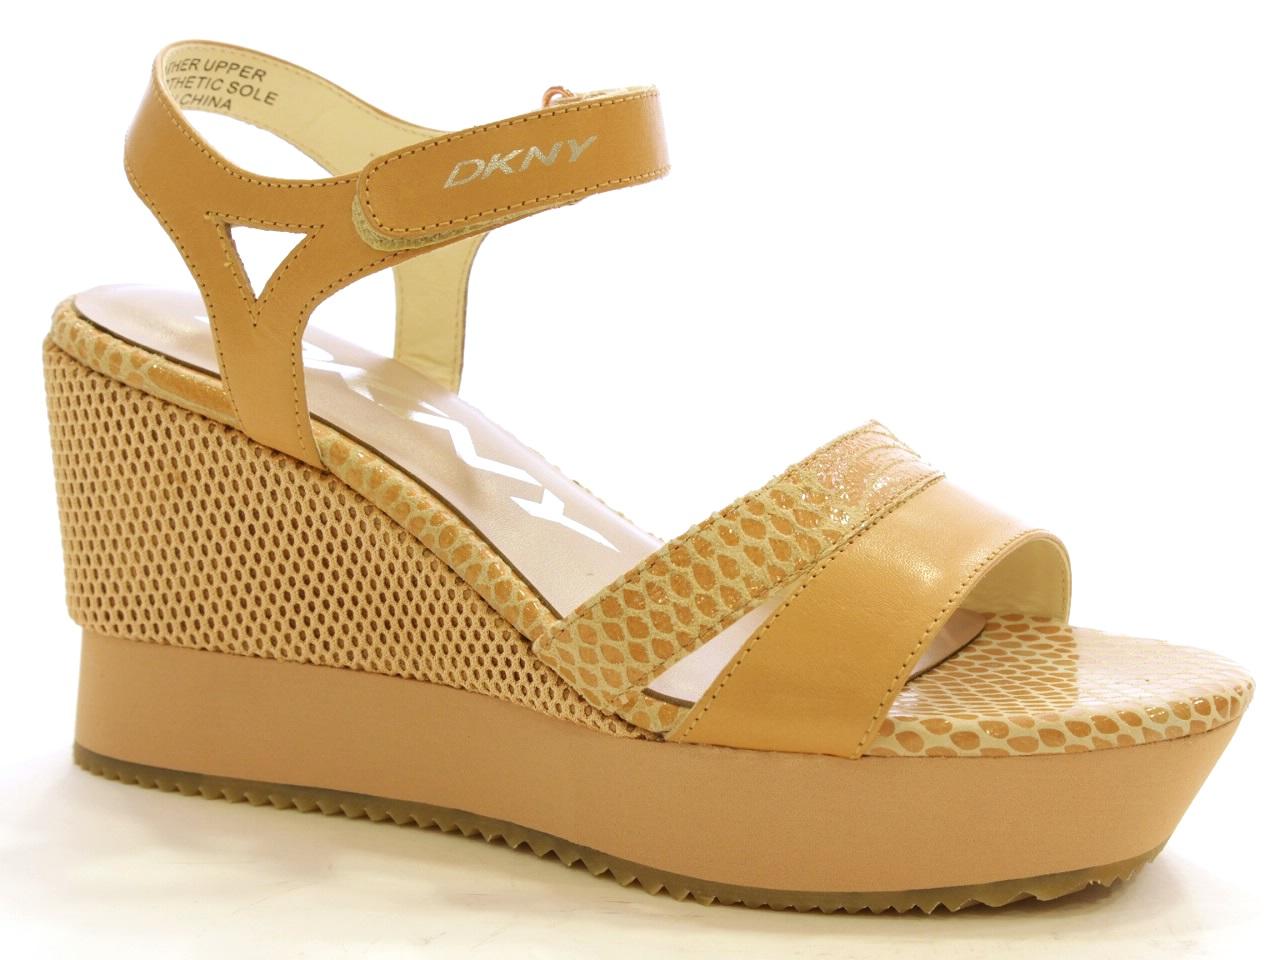 Wedge Sandals DKNY - 352 23142468